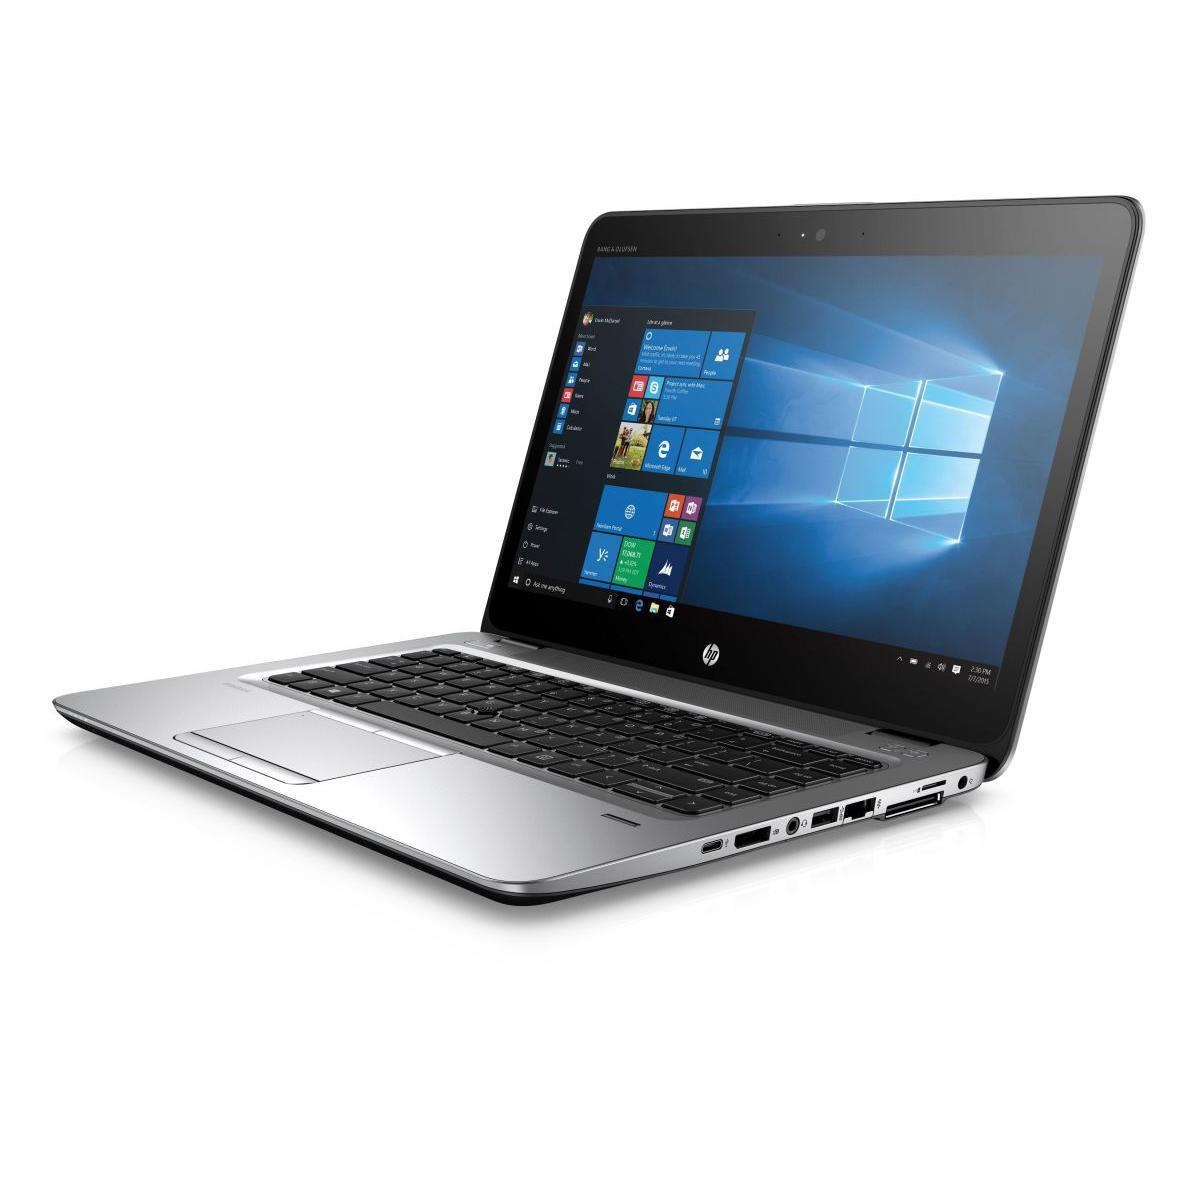 "HP EliteBook 840 G3 14"" Core i5 2,3 GHz - SSD 256 GB - 8GB Tastiera Inglese (US)"